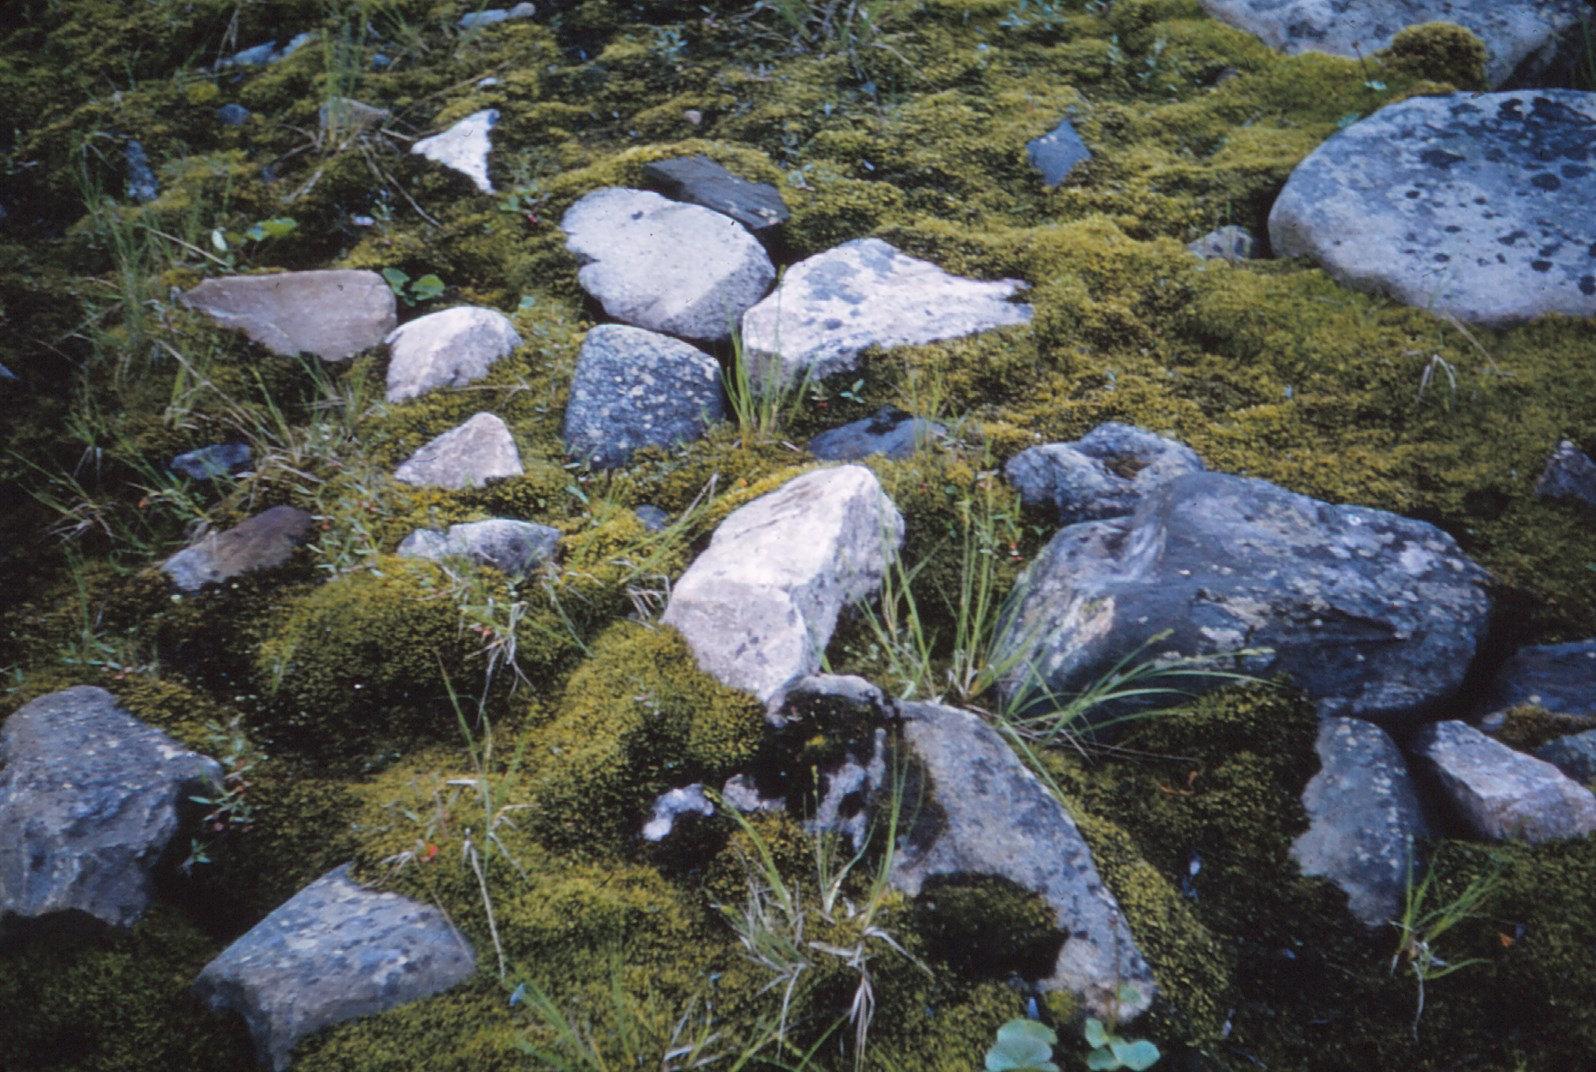 1105 (31) Grote hoekige stenen tussen mos